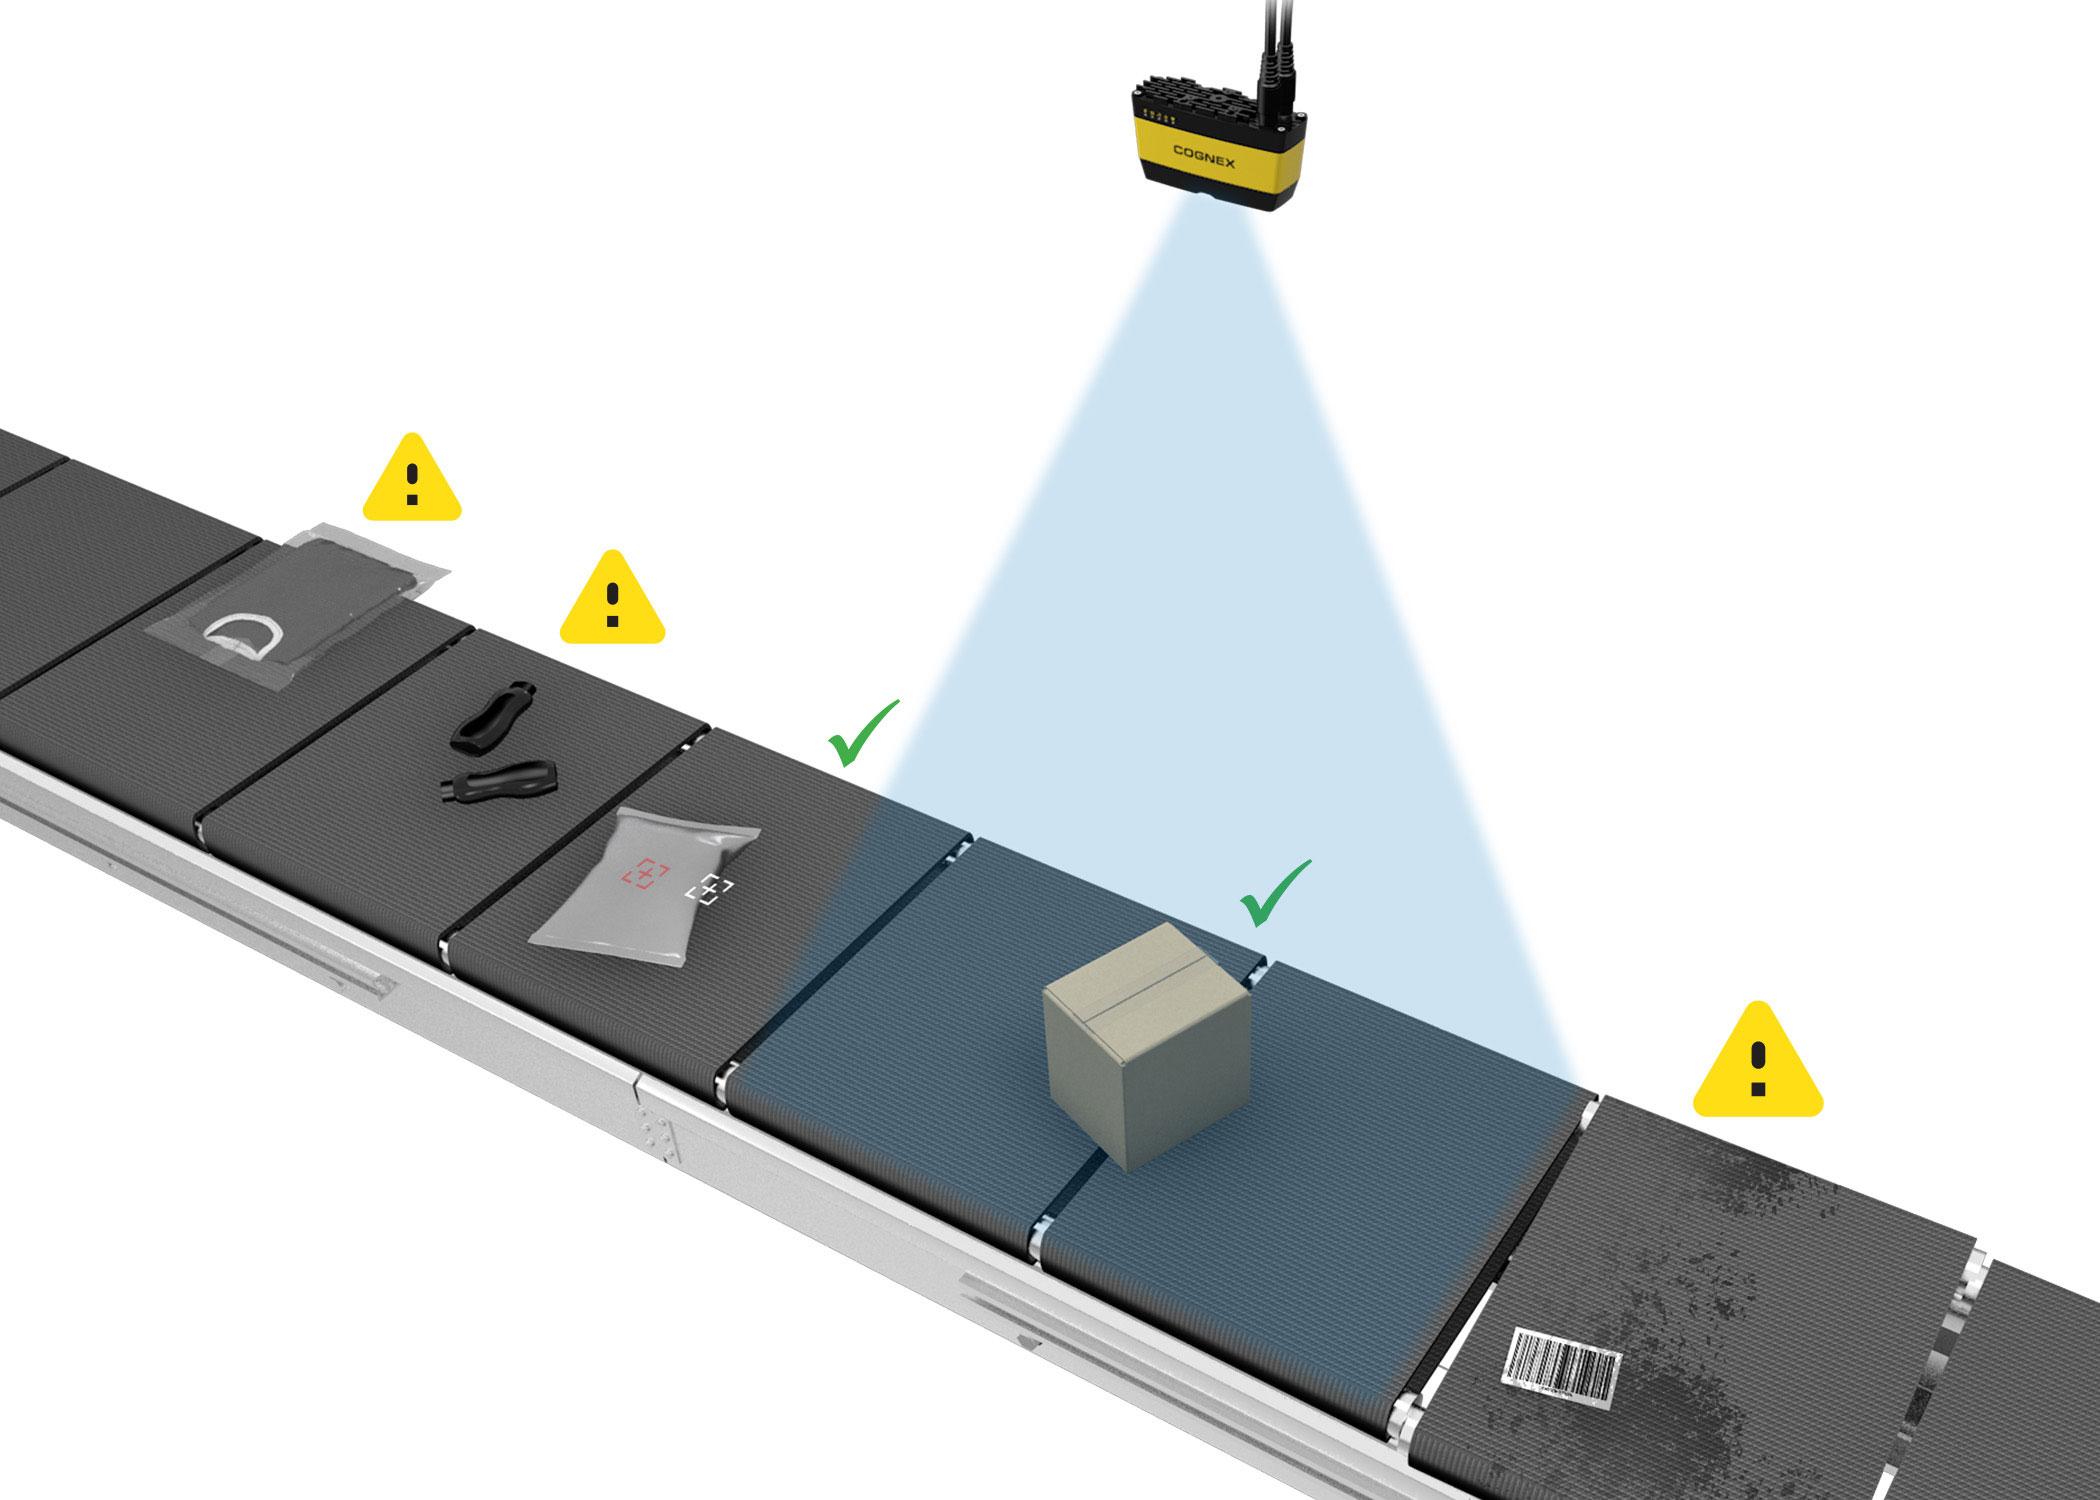 3D-A1000 Item Detection on conveyor